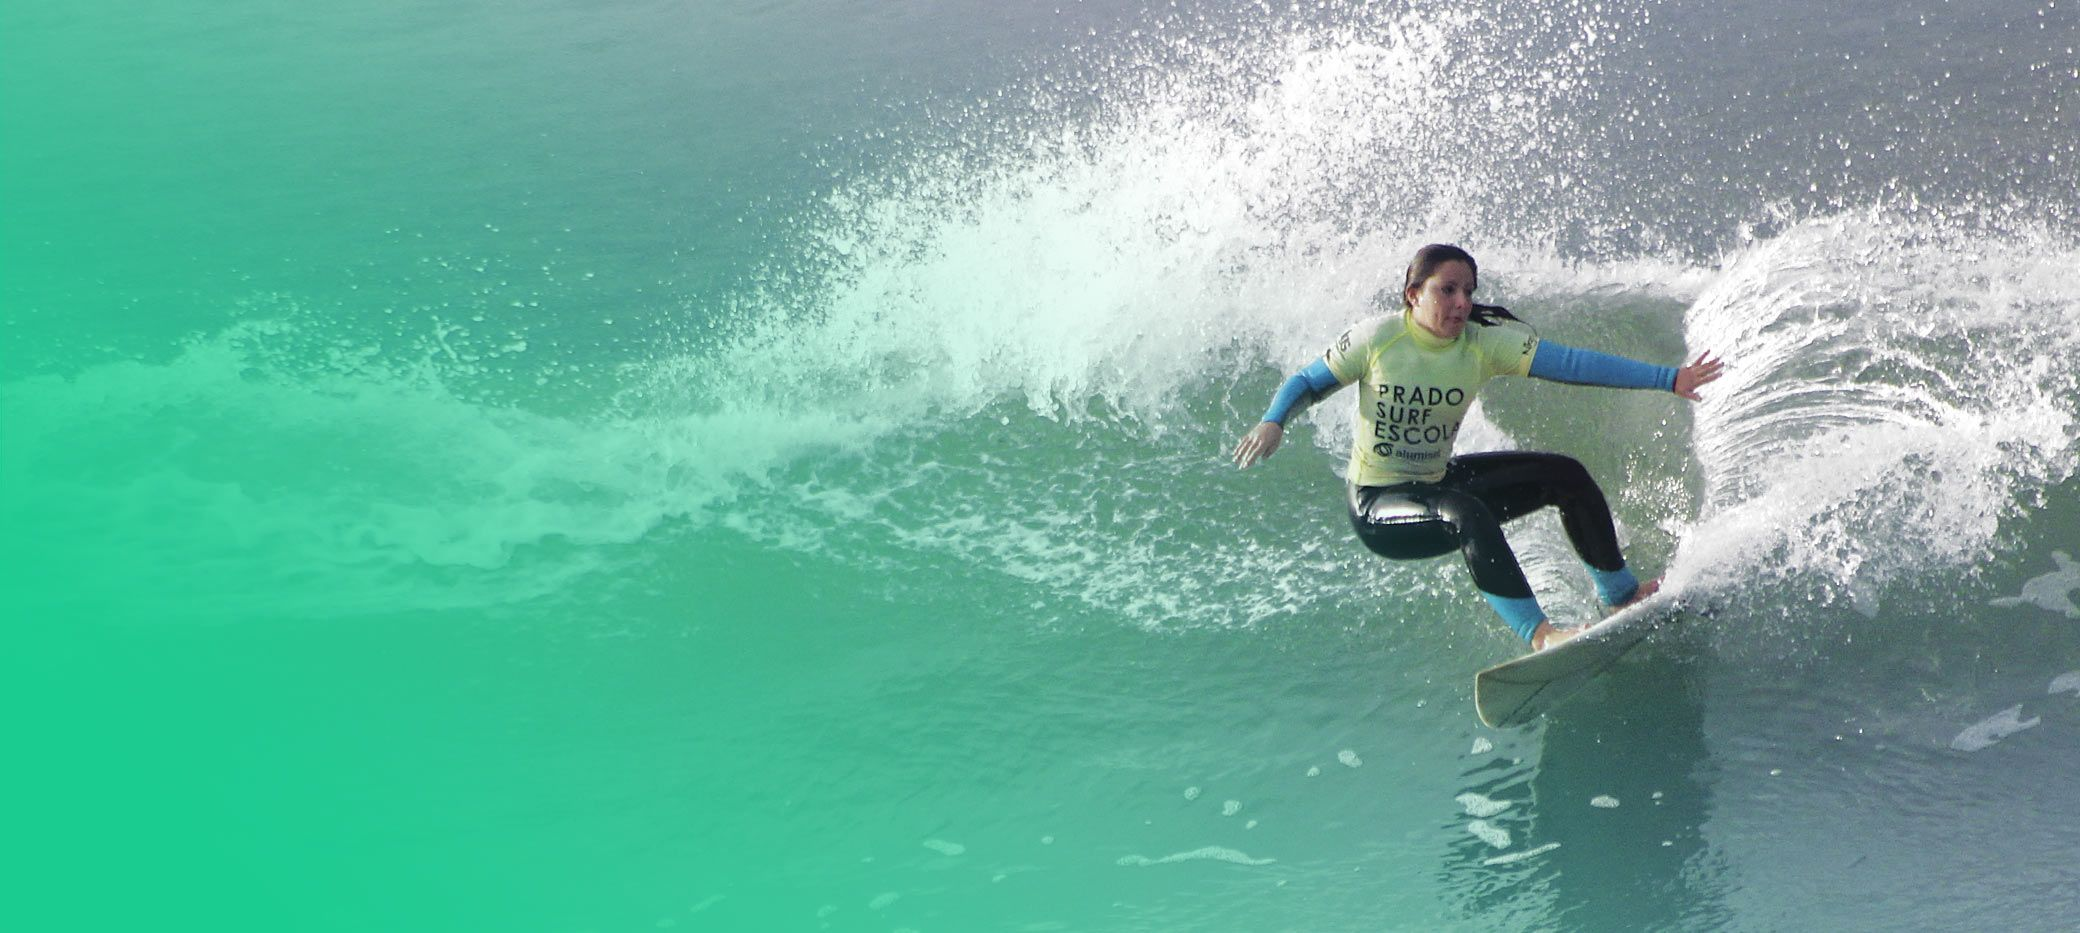 Surfer girl galicia